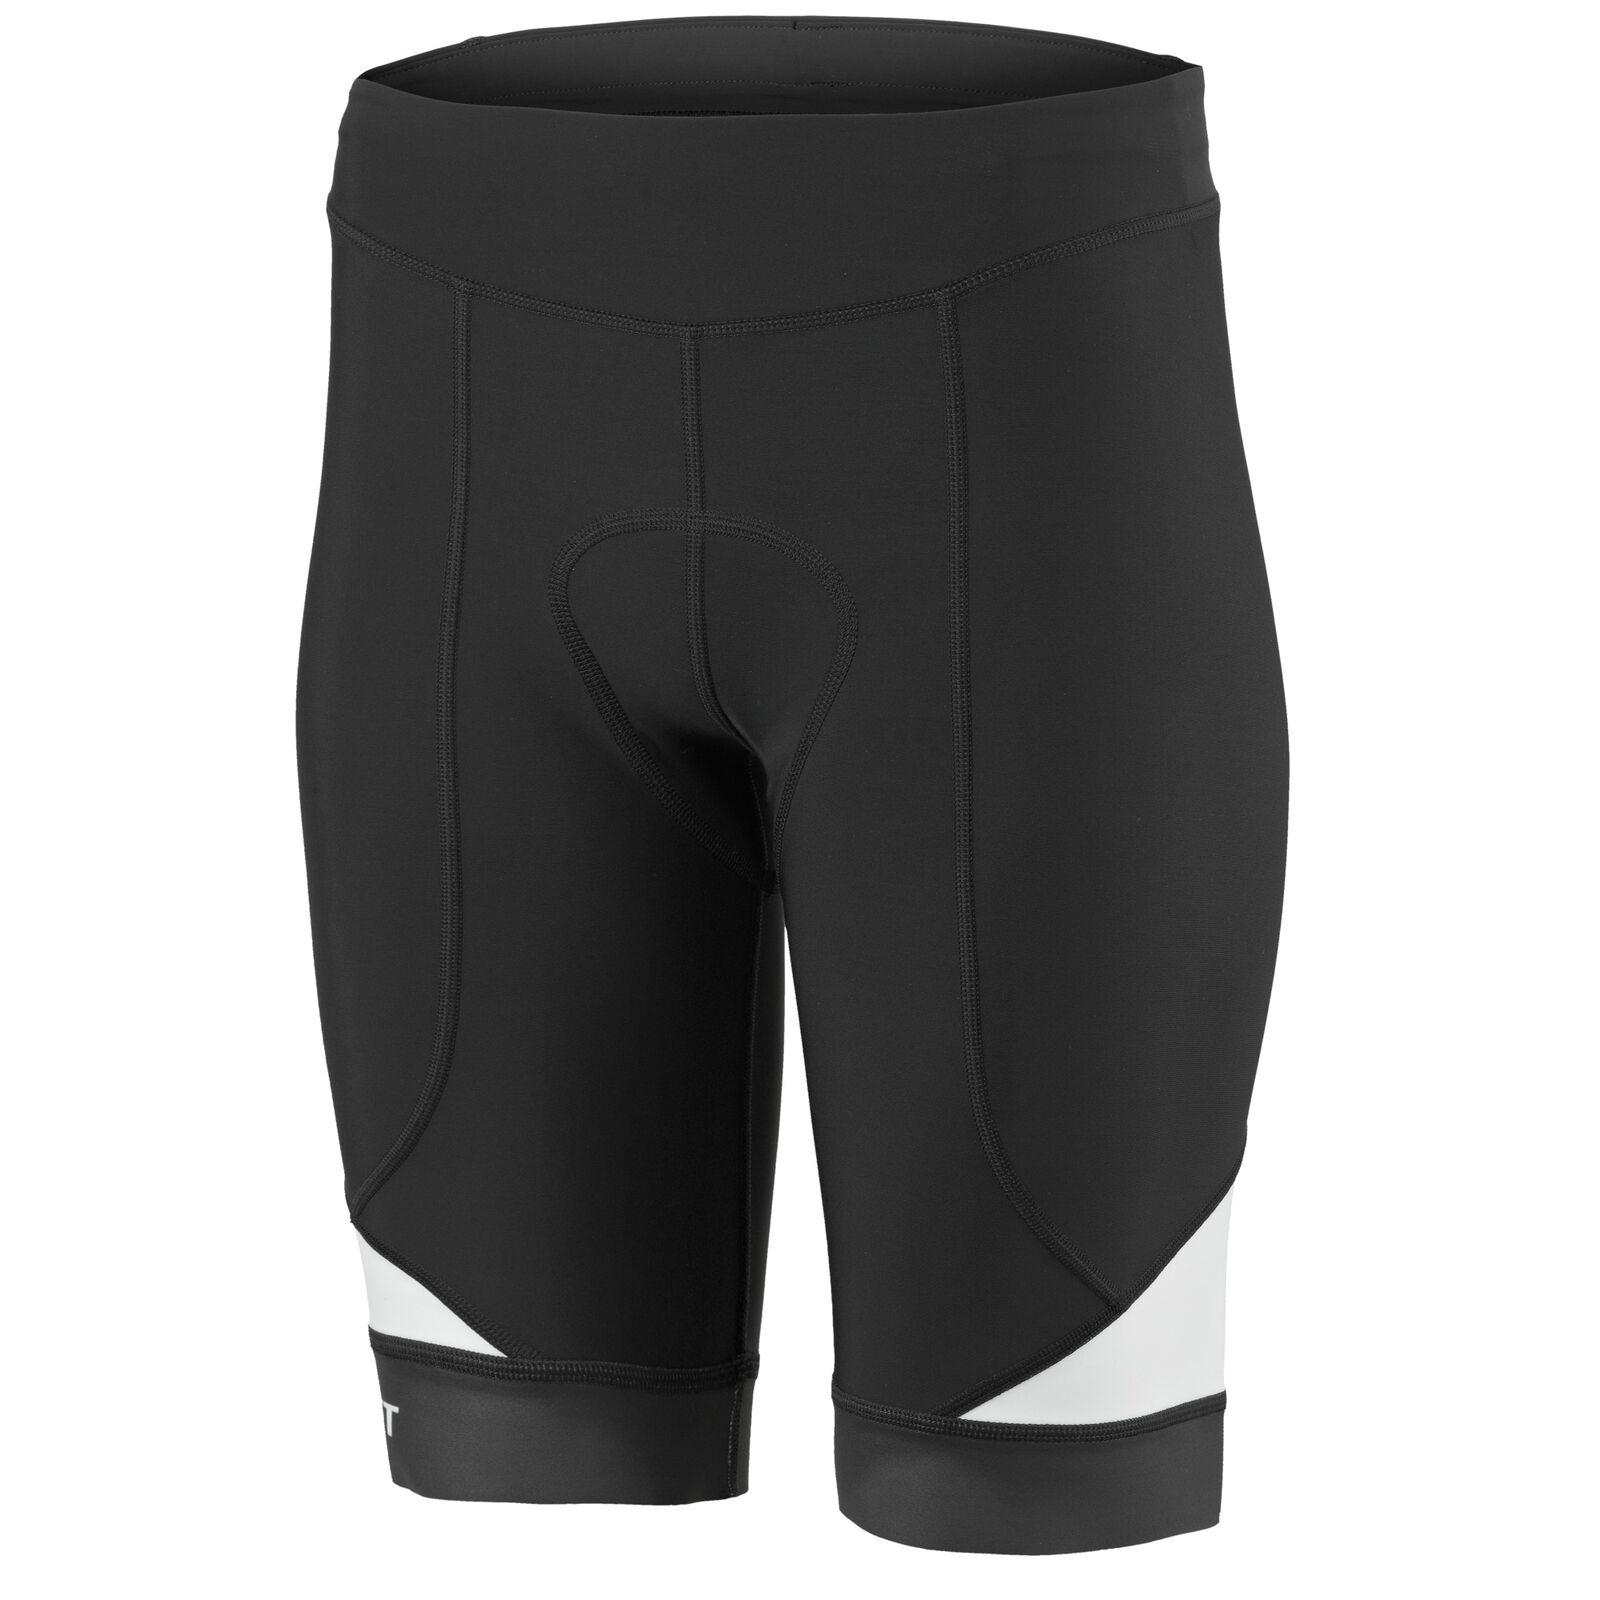 SCOTT W's Endurance 20 pantaloncini ciclismo donna neri bici bicicletta short